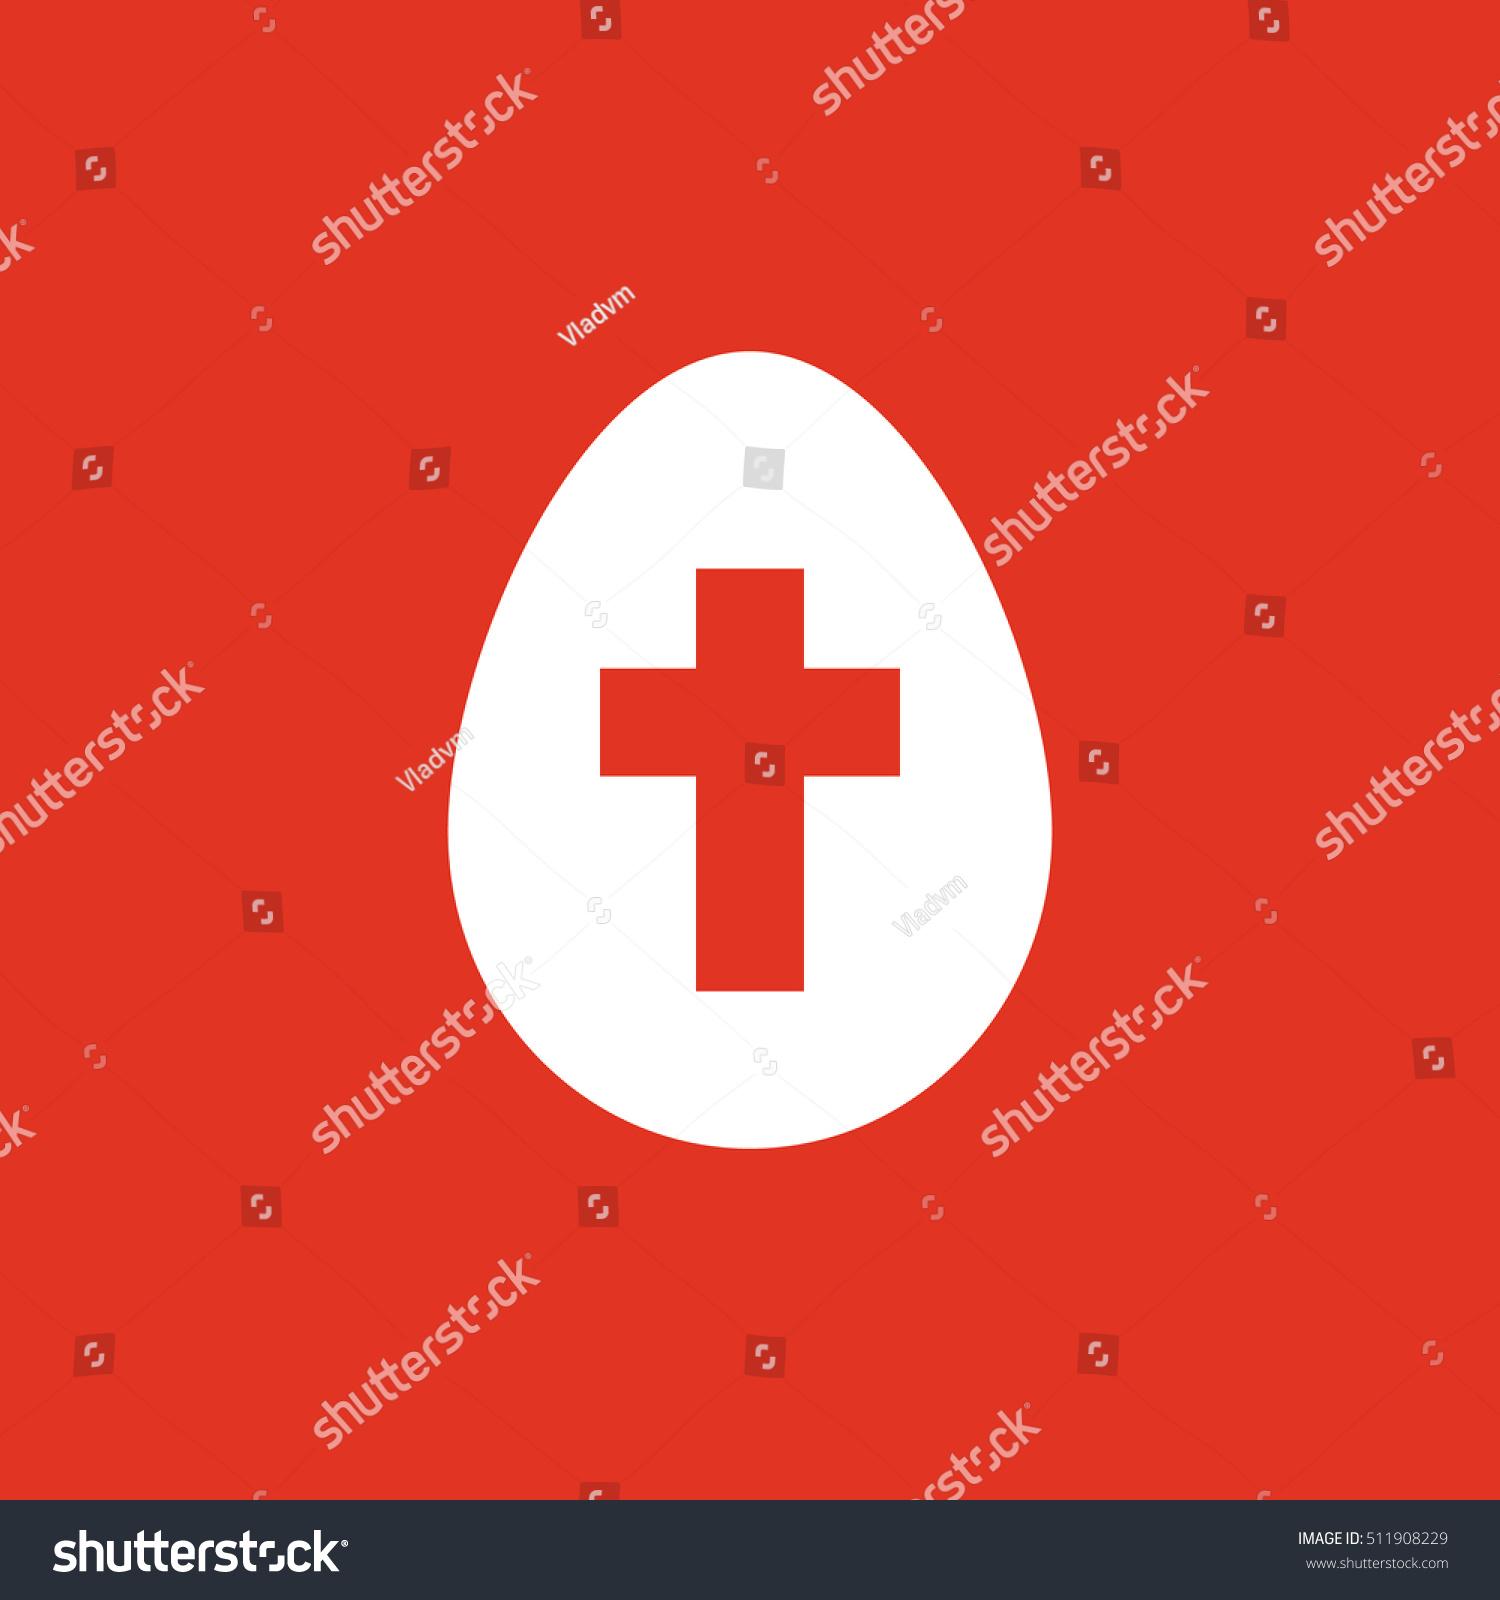 Egg icon easter egg symbol ui stock vector 511908229 shutterstock the egg icon easter egg symbol ui web logo sign buycottarizona